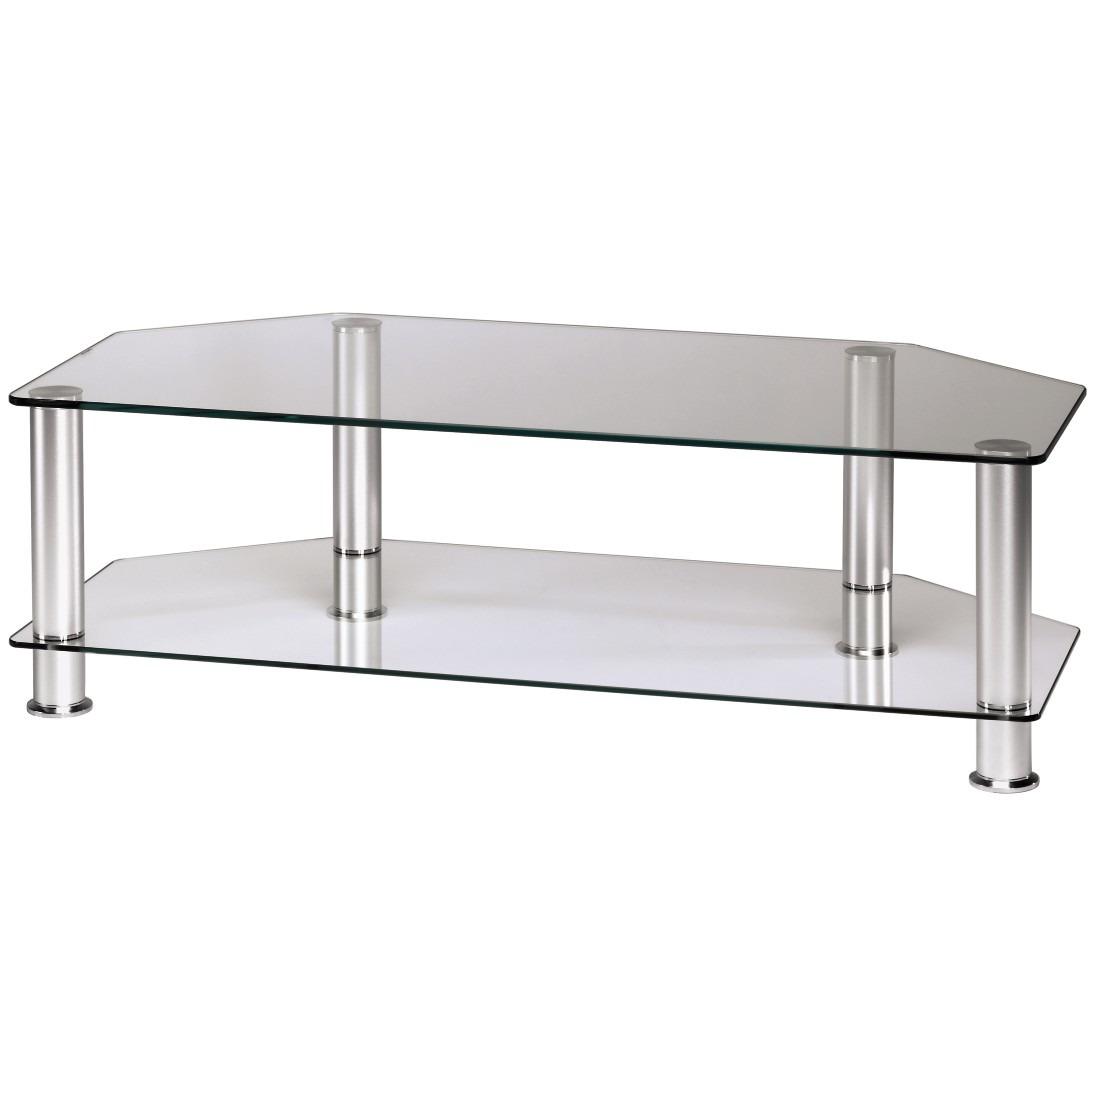 Afbeelding van Hama tv meubel TV meubel 1m 2 boorden aluminium + glas transparant